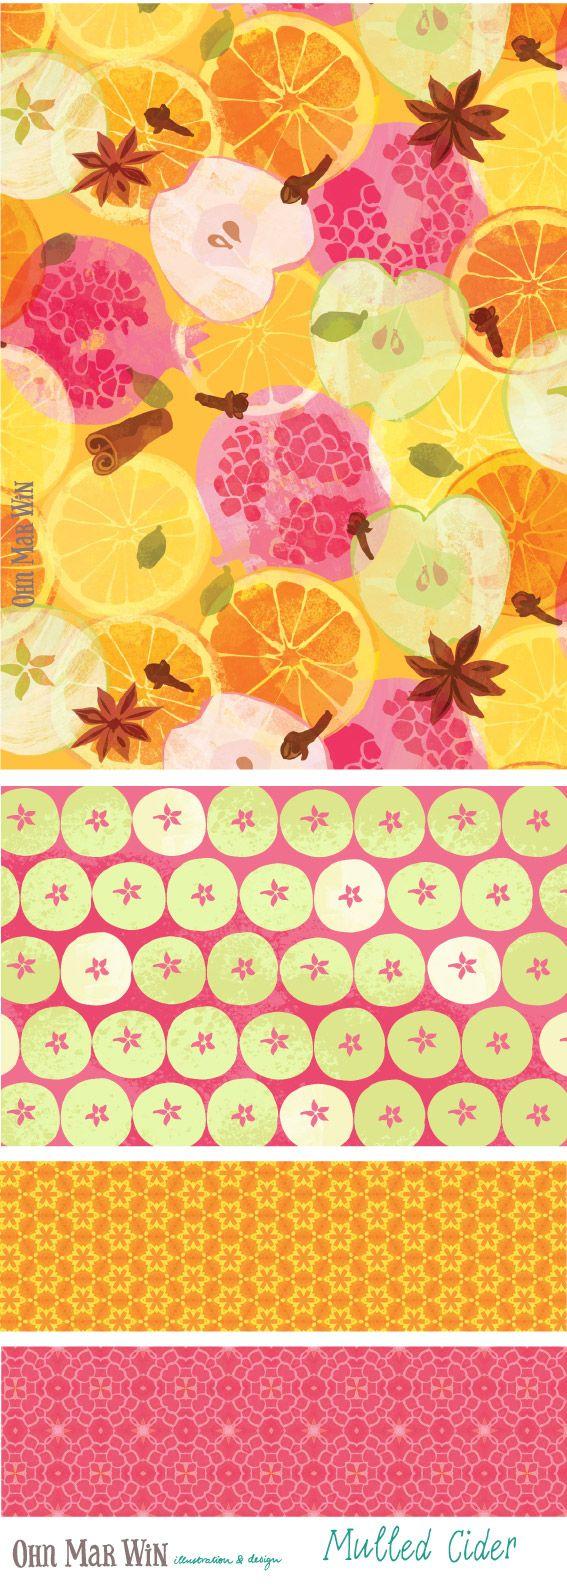 FOOD & DRINK — Ohn Mar Win Illustration Mulled cider wine pomegranate apple spices Fall harvest Food illustrator